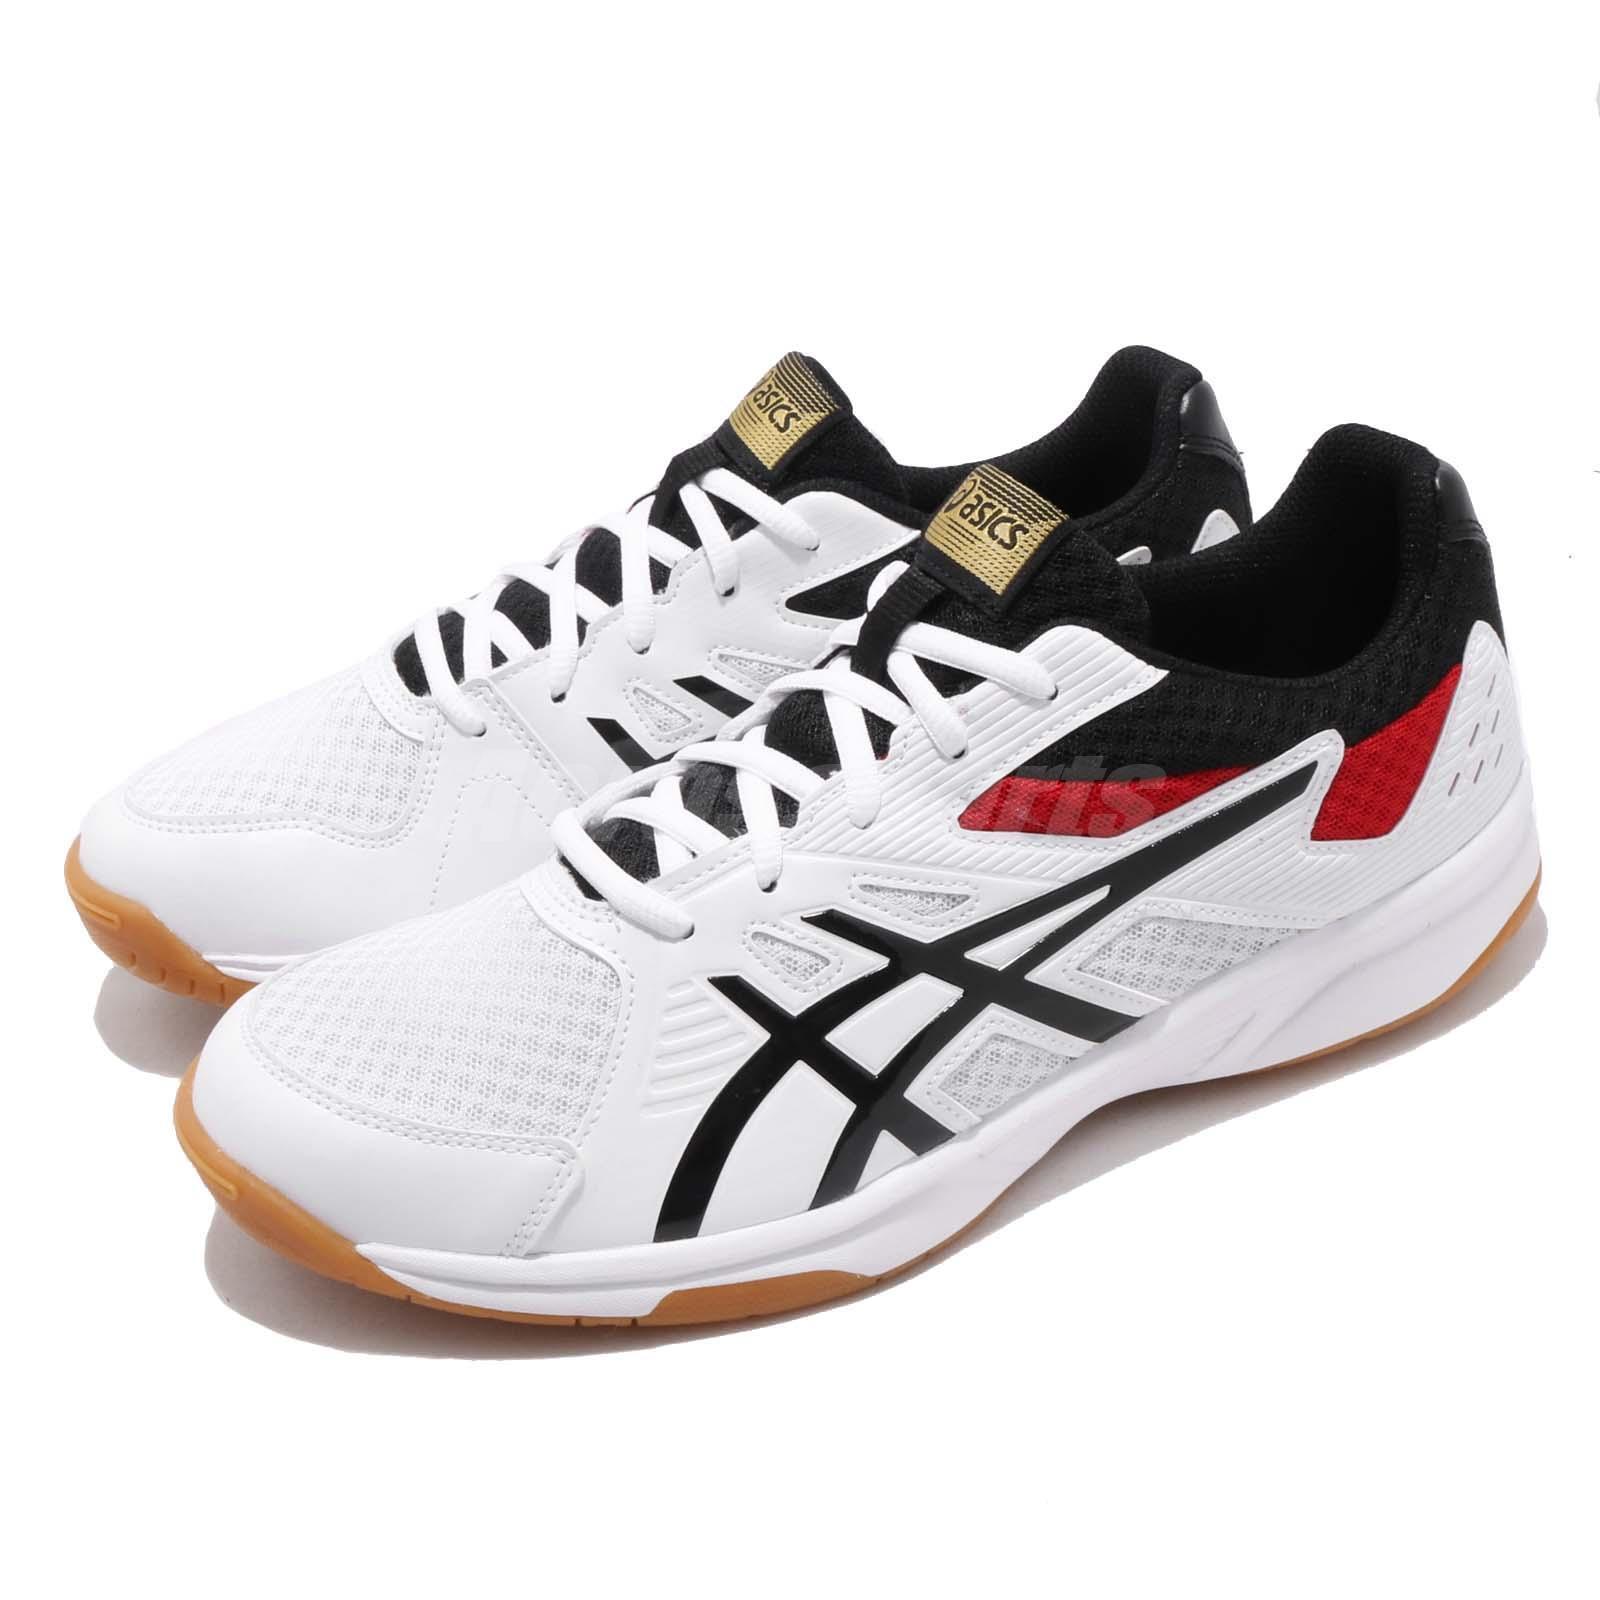 Asics Upcourt 3 blancoo negro Gum Men Volleyball Badminton zapatos 1071A019-110